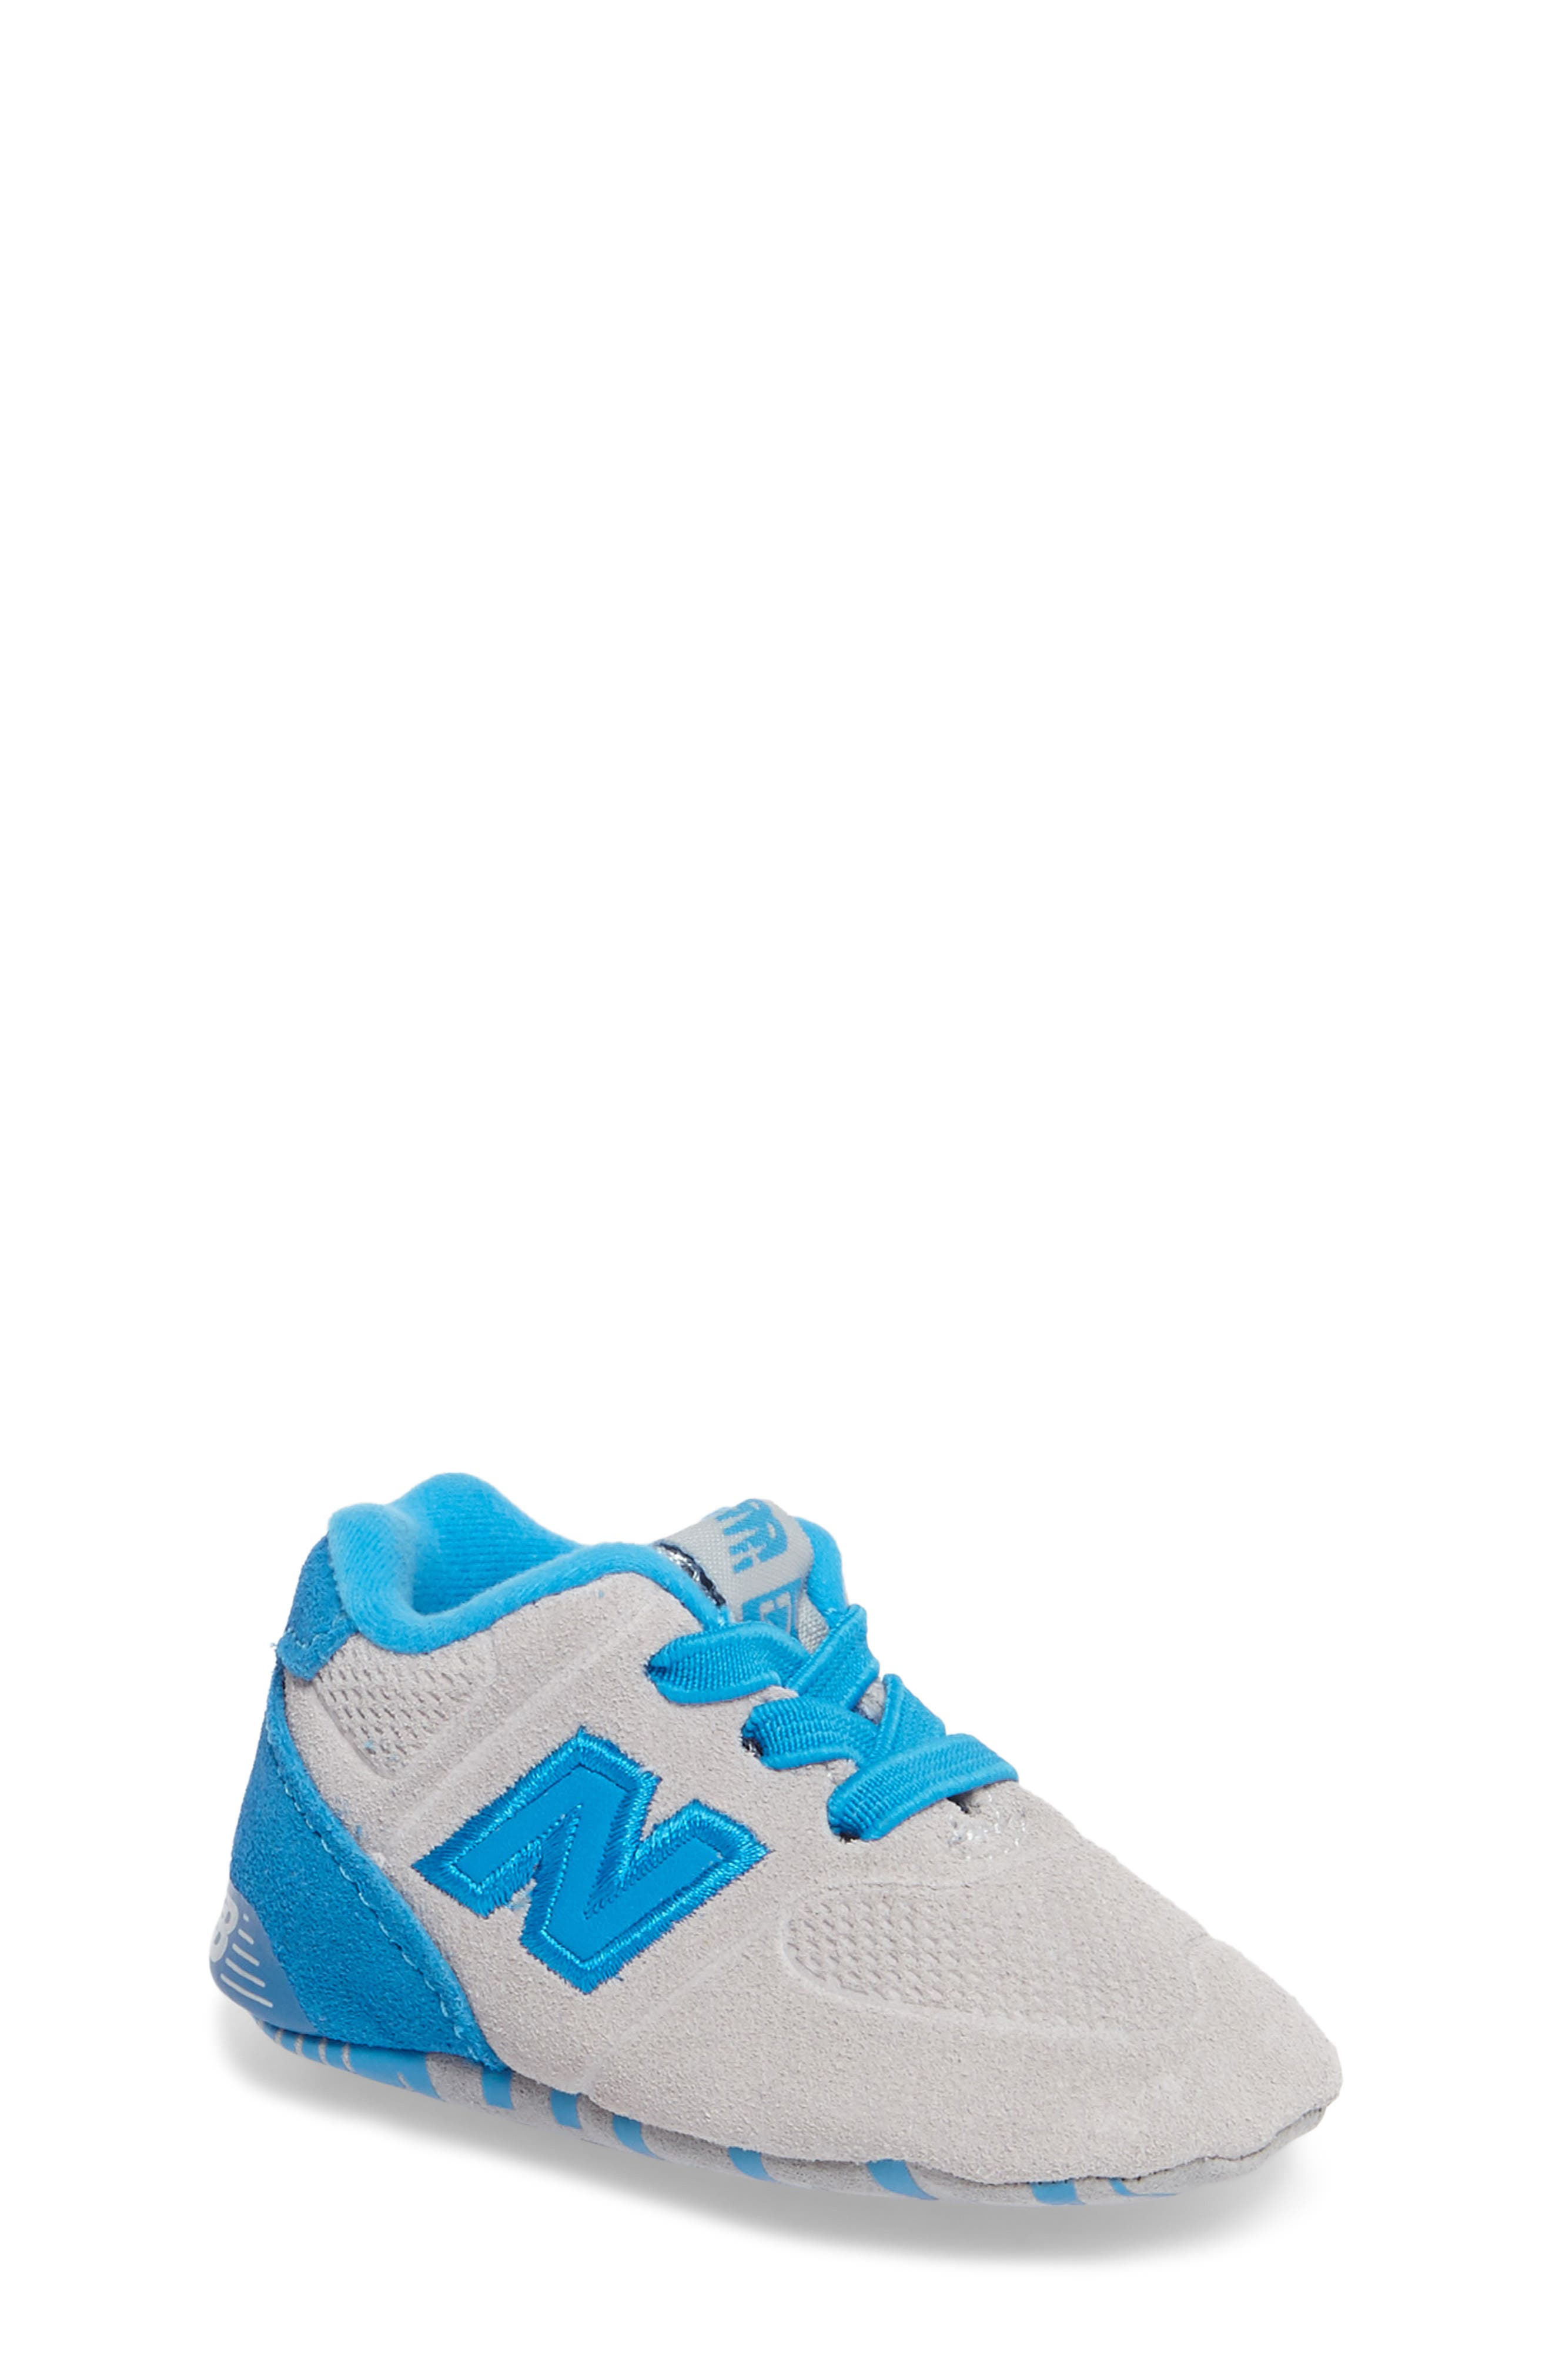 547 Crib Shoe,                             Main thumbnail 1, color,                             Blue/ Grey